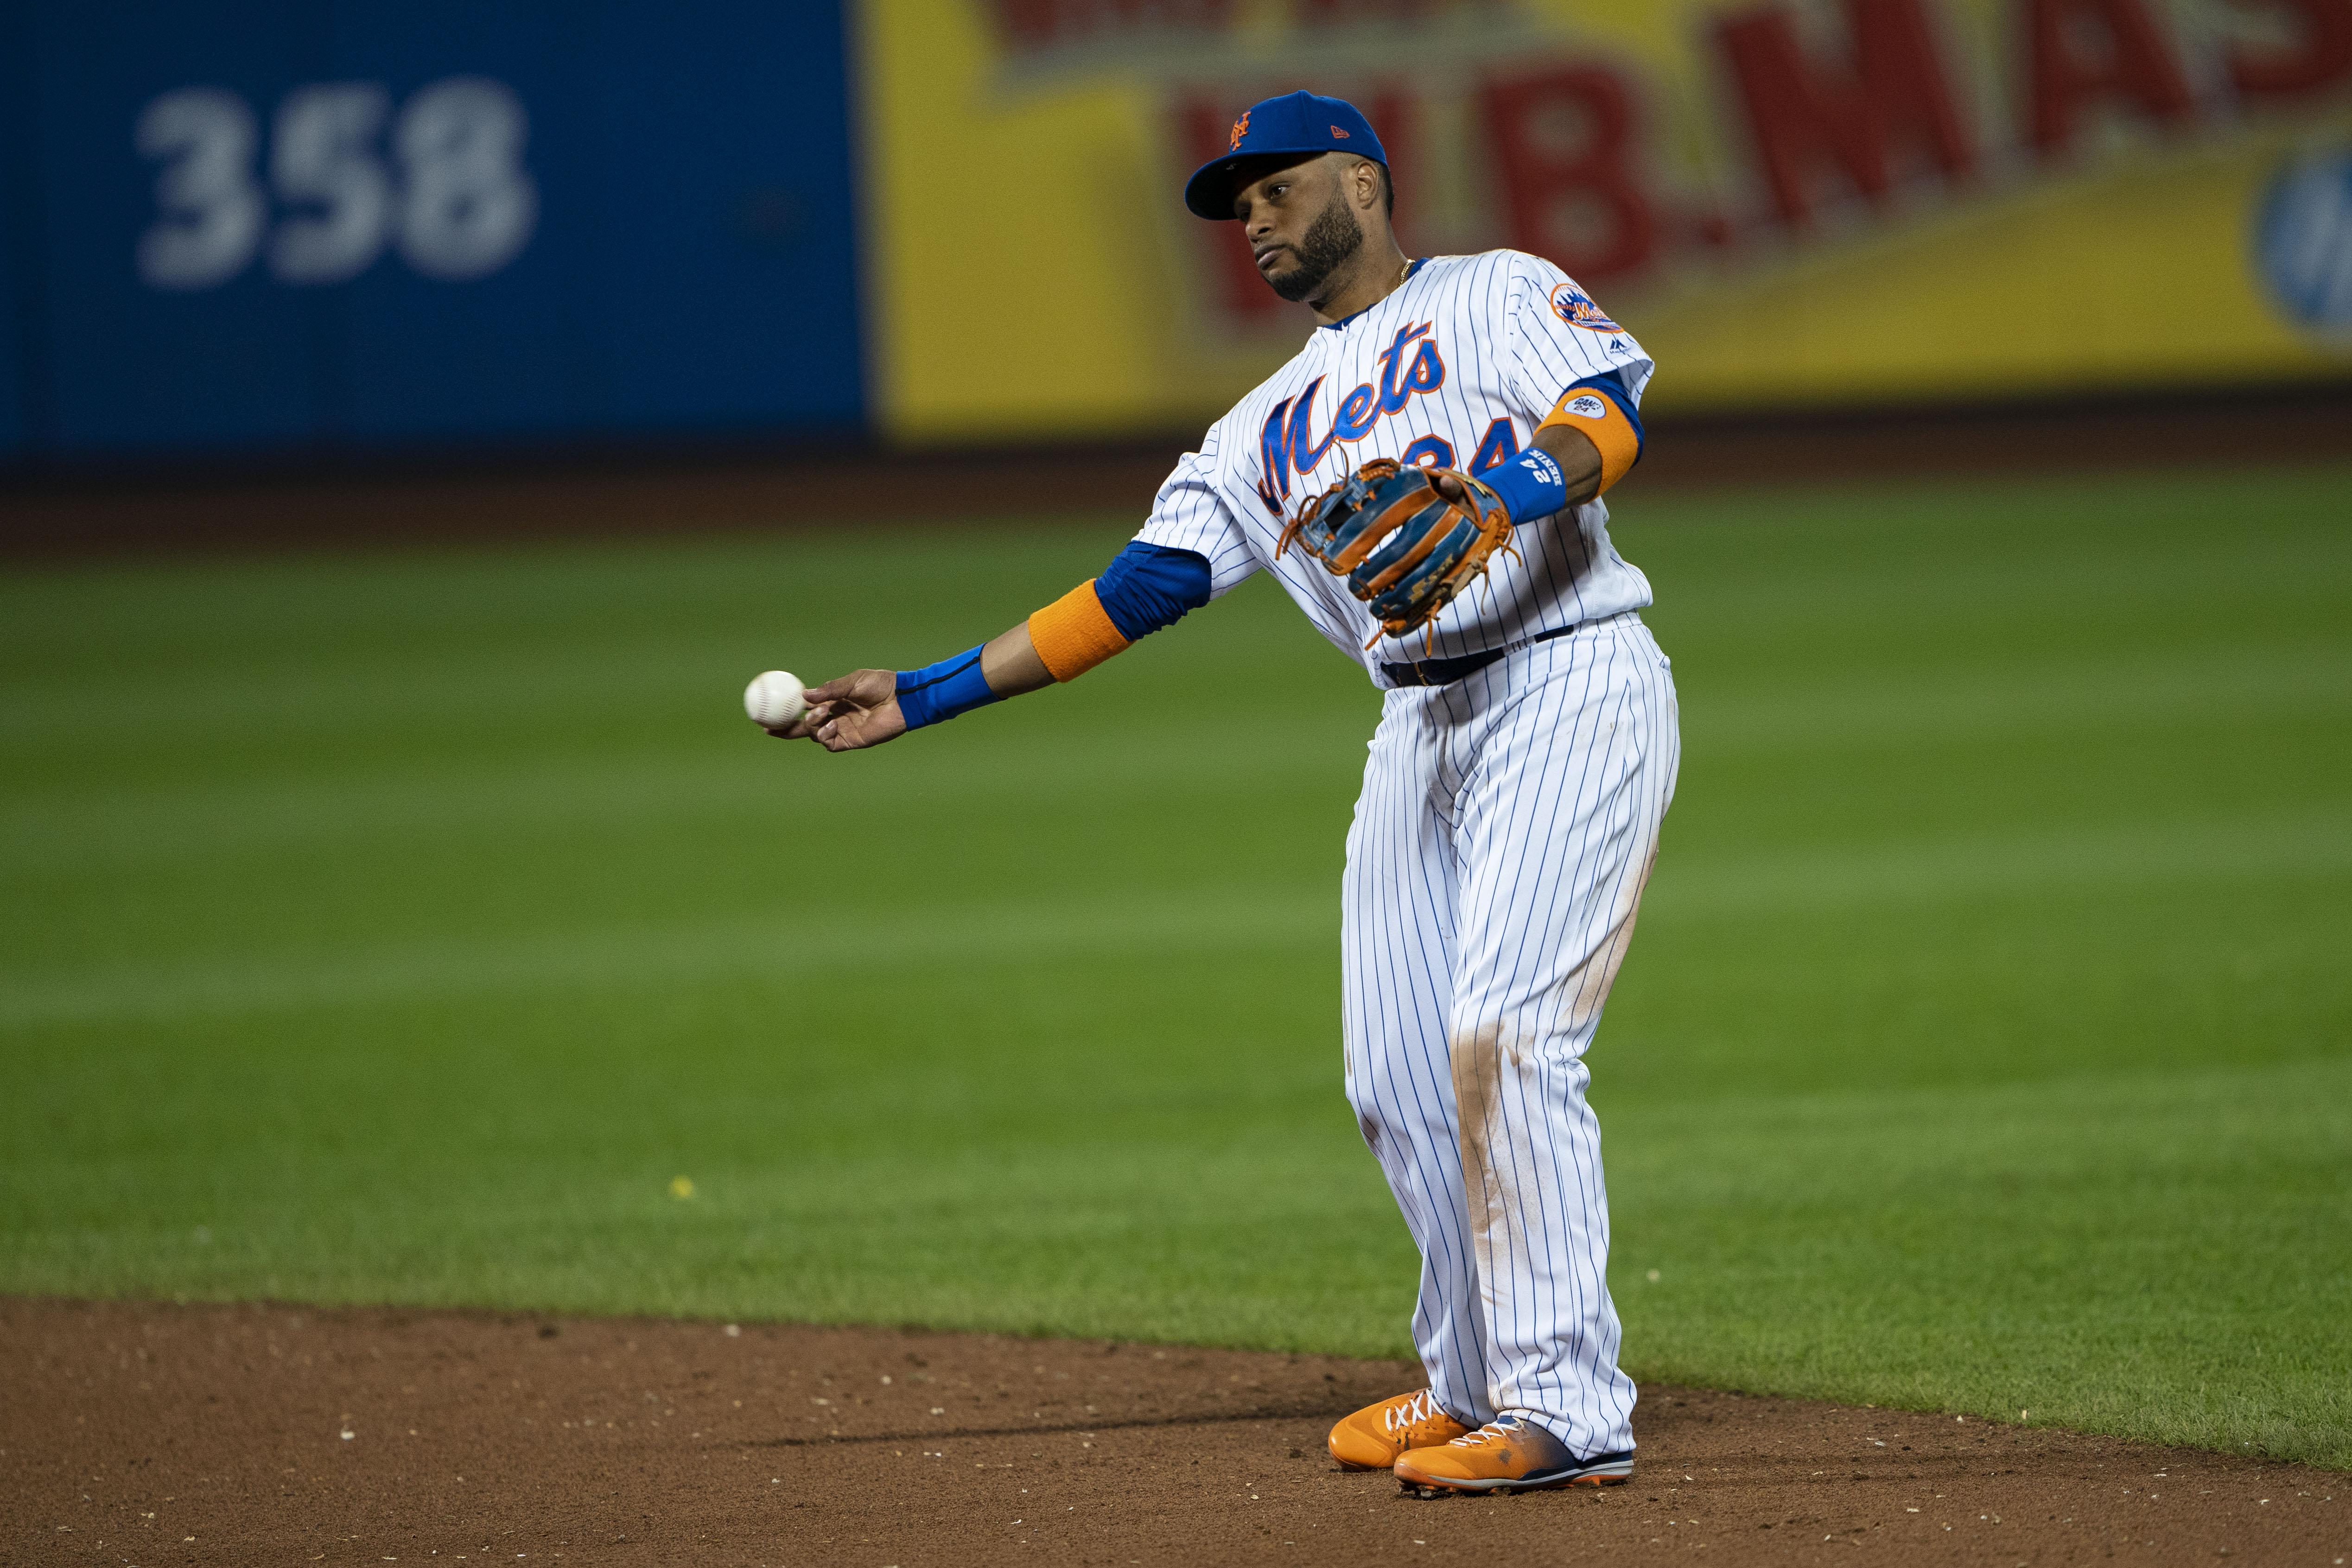 9/10/19 Game Preview: Arizona Diamondbacks at New York Mets